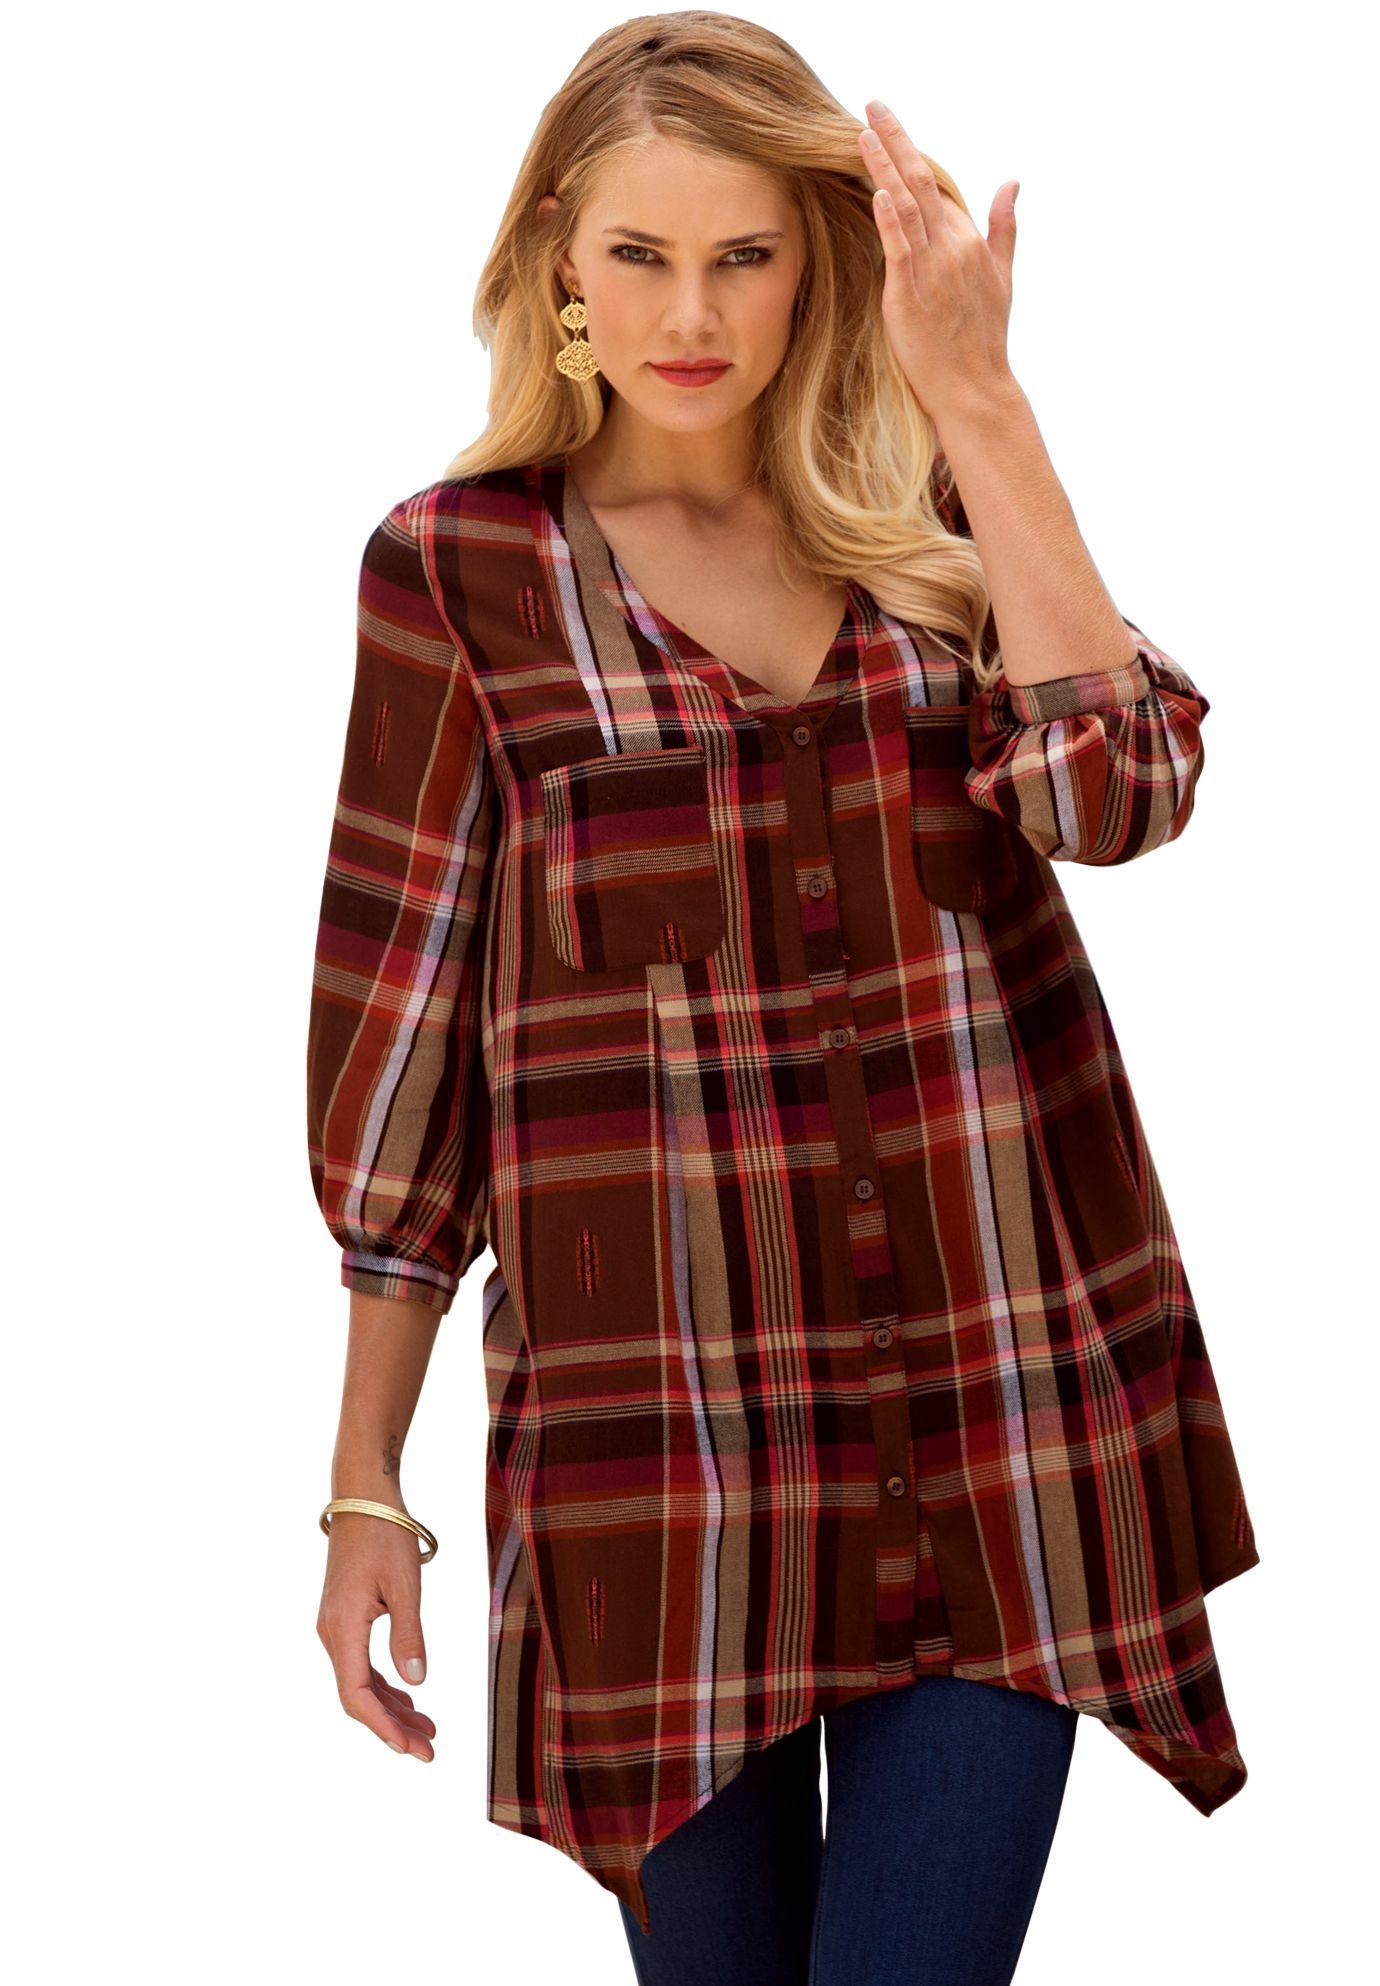 Flannel shirt plus size  Plus Size Plaid Flannel Bigshirt  shirts  Pinterest  Tartan